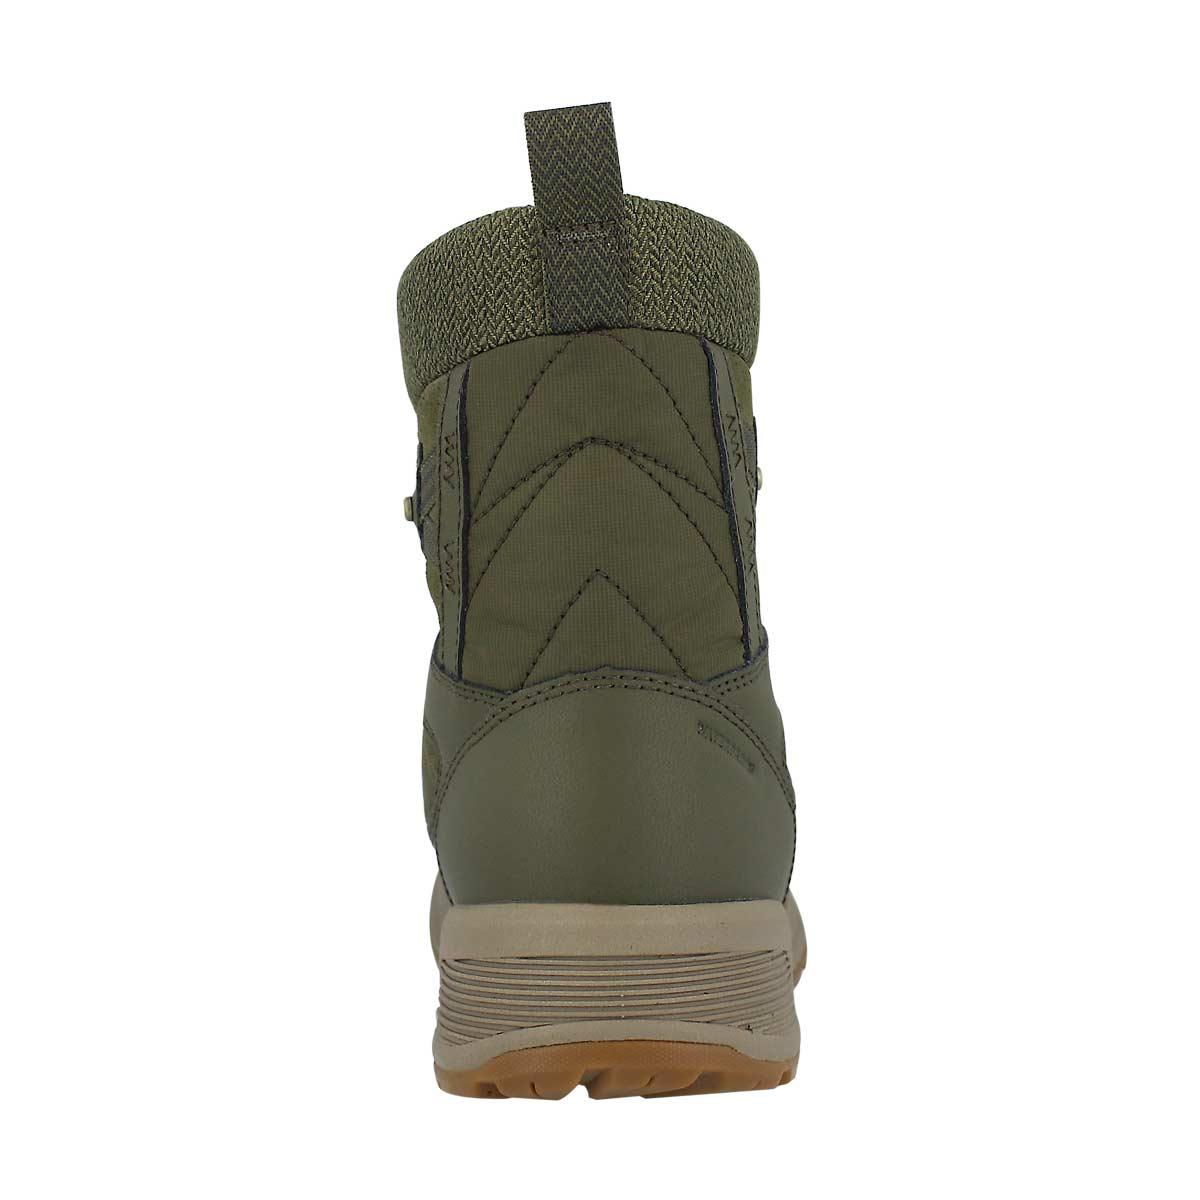 Lds MeadowsShorty OmniHeat 3D nori boot